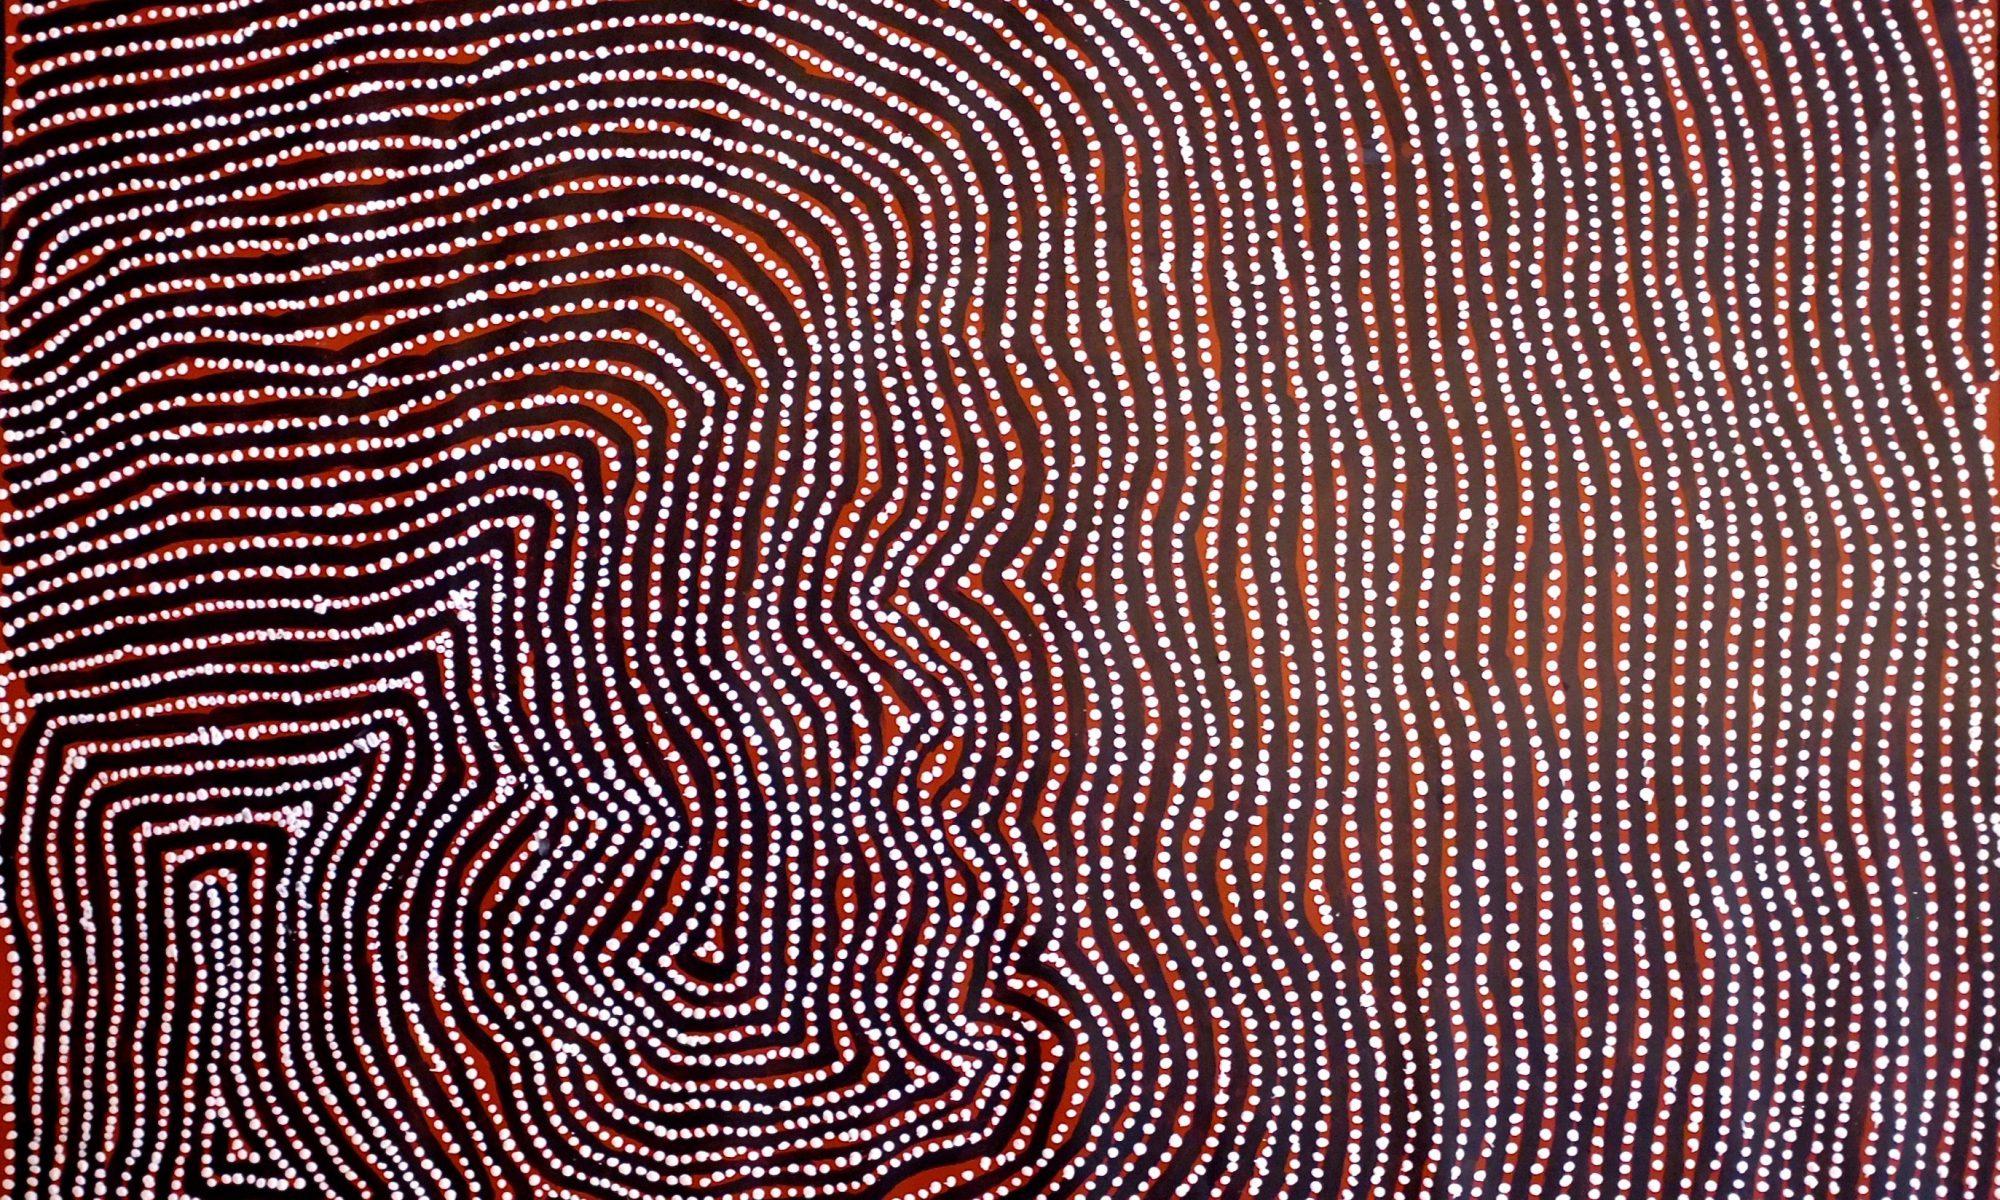 Warlapiringa Tjapaltjari, Tingari Dreaming, 2013, acrylique su rotule, 122 x 98 cm.